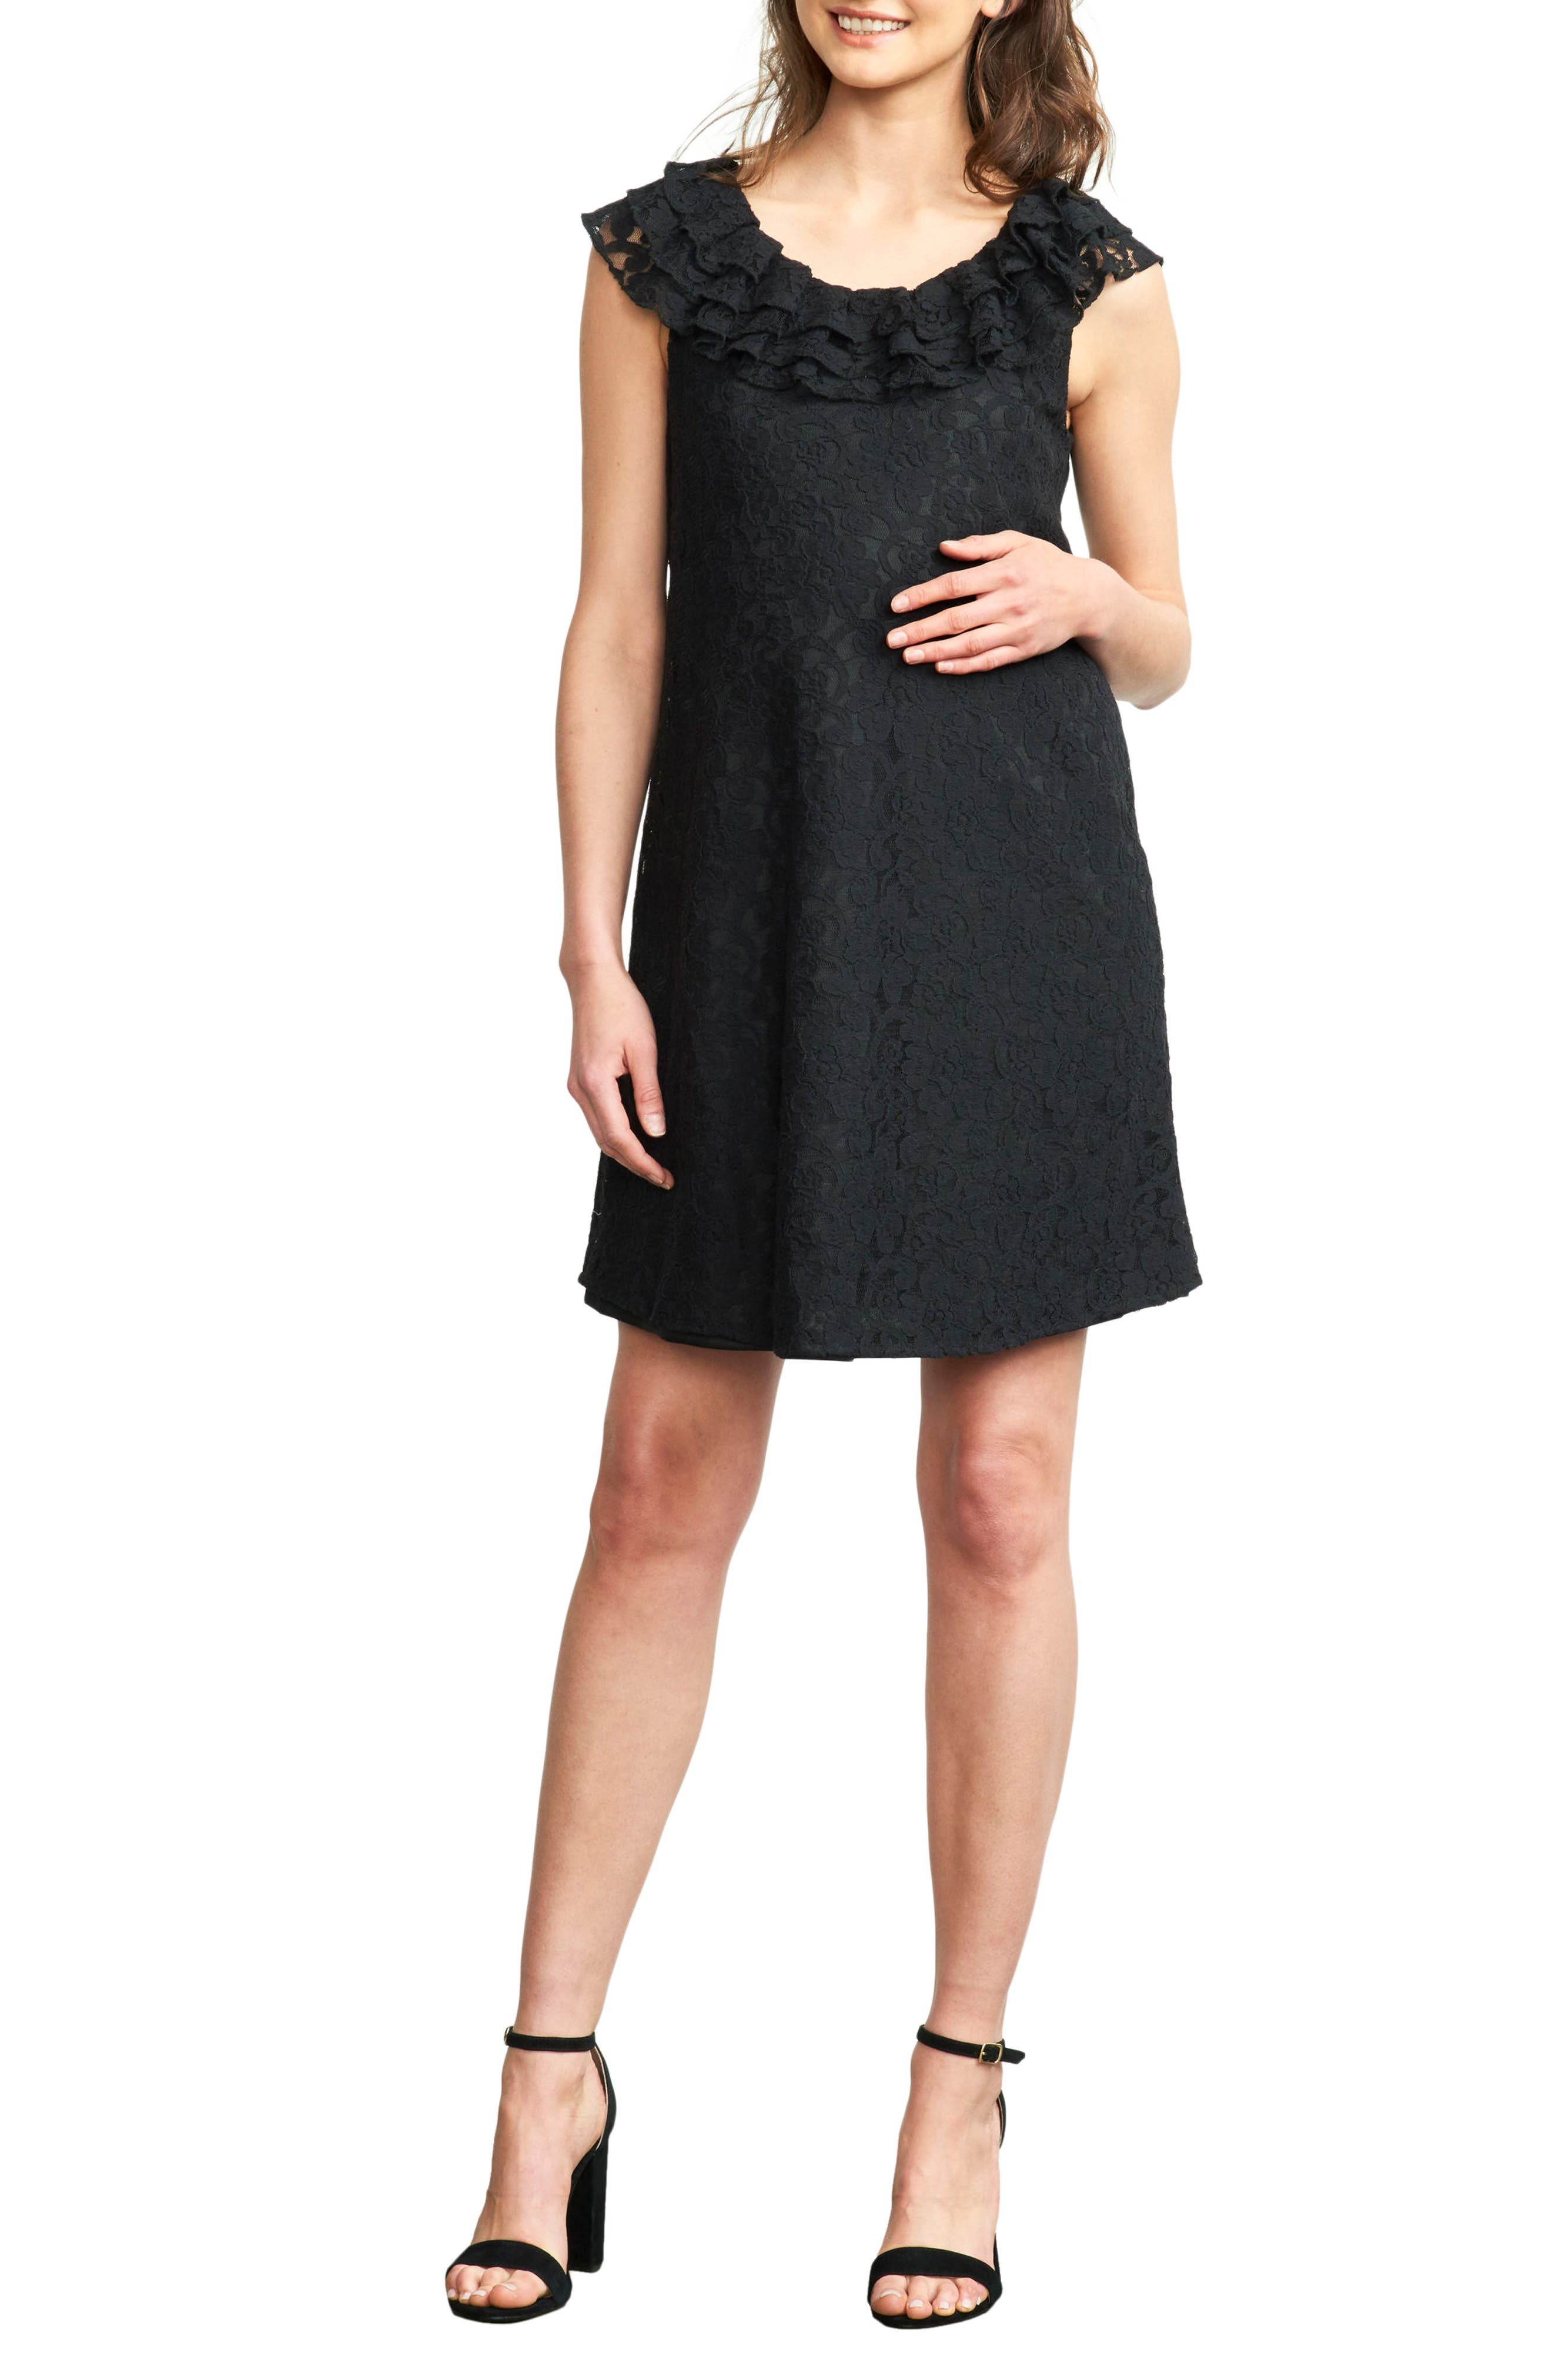 Ruffled Maternity Dress,                             Main thumbnail 1, color,                             BLACK LACE